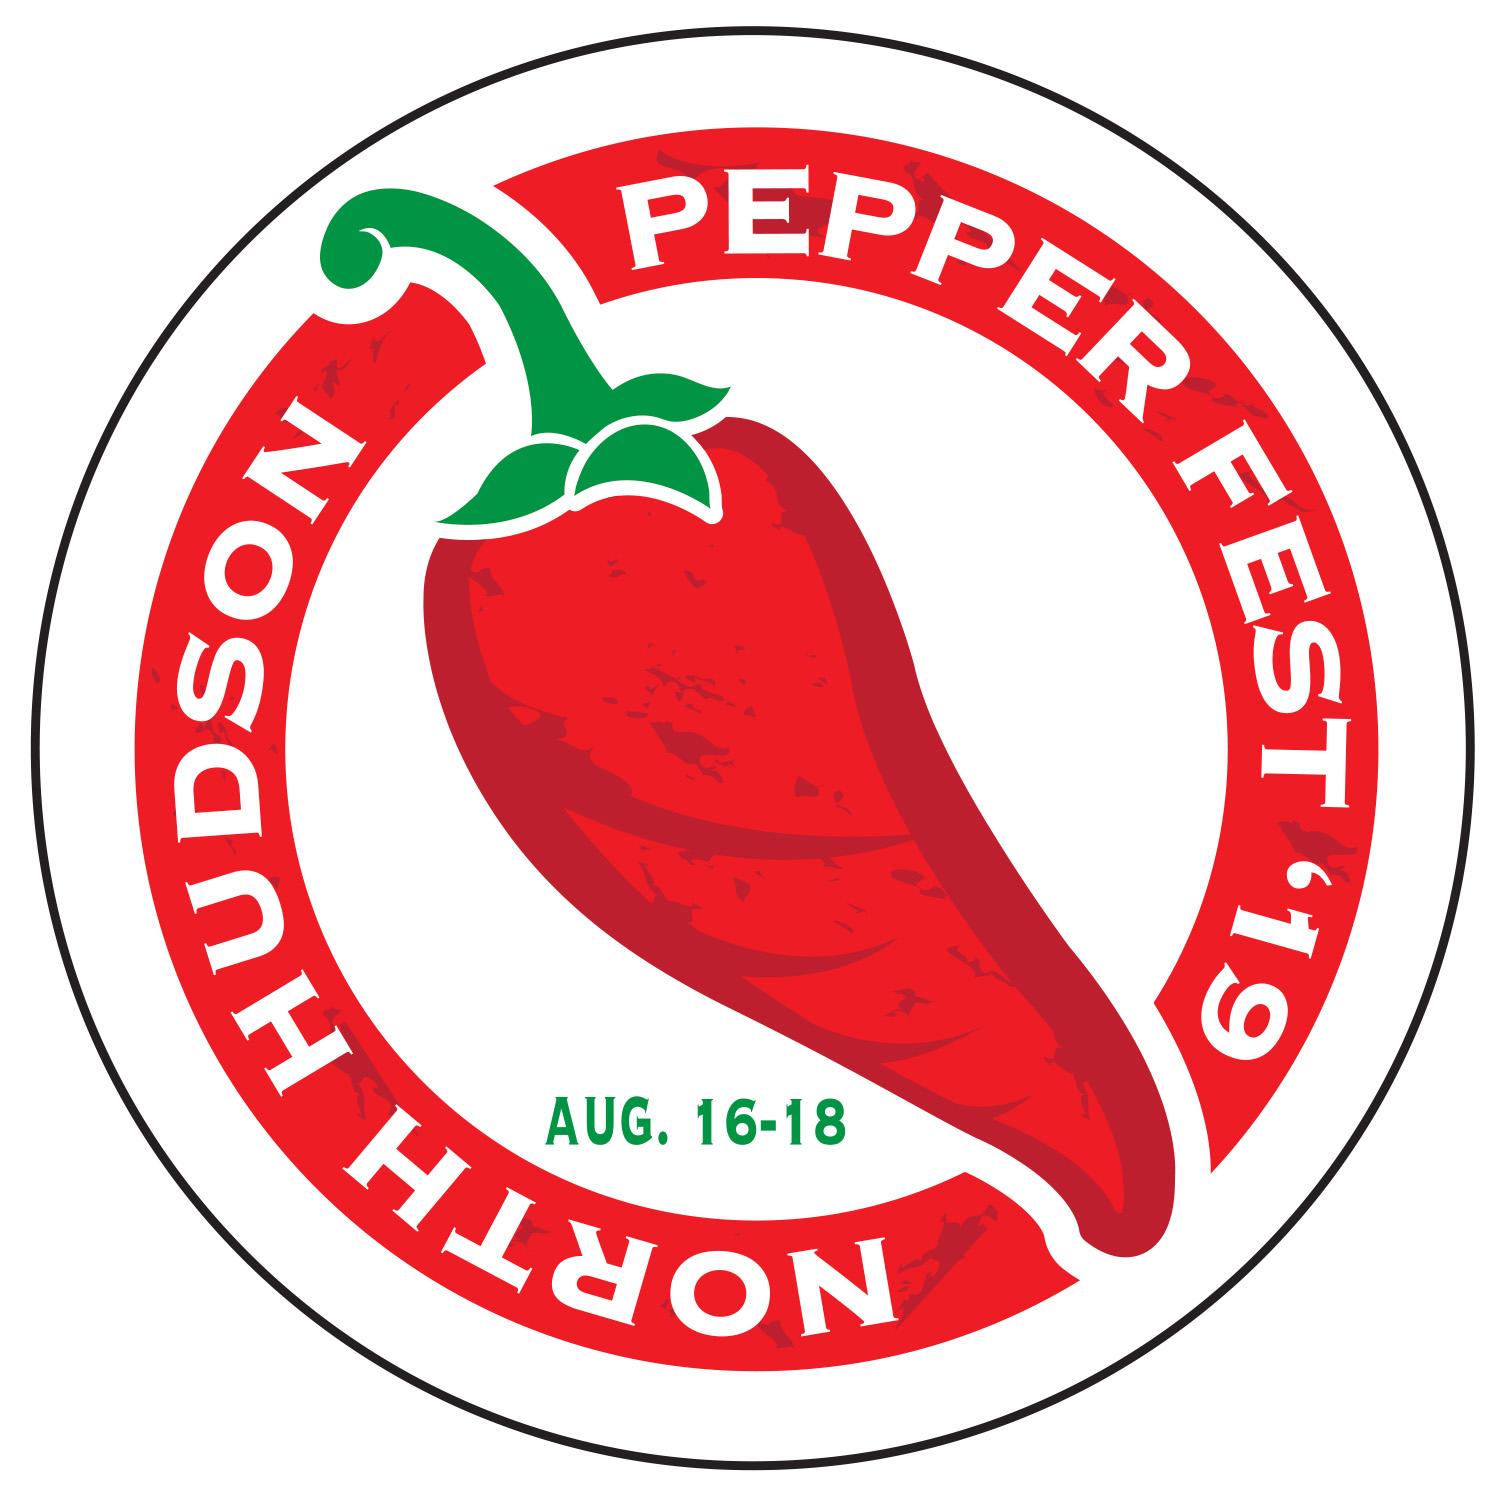 LargePepperFest_NorthHudson_Logo2019_button.jpg